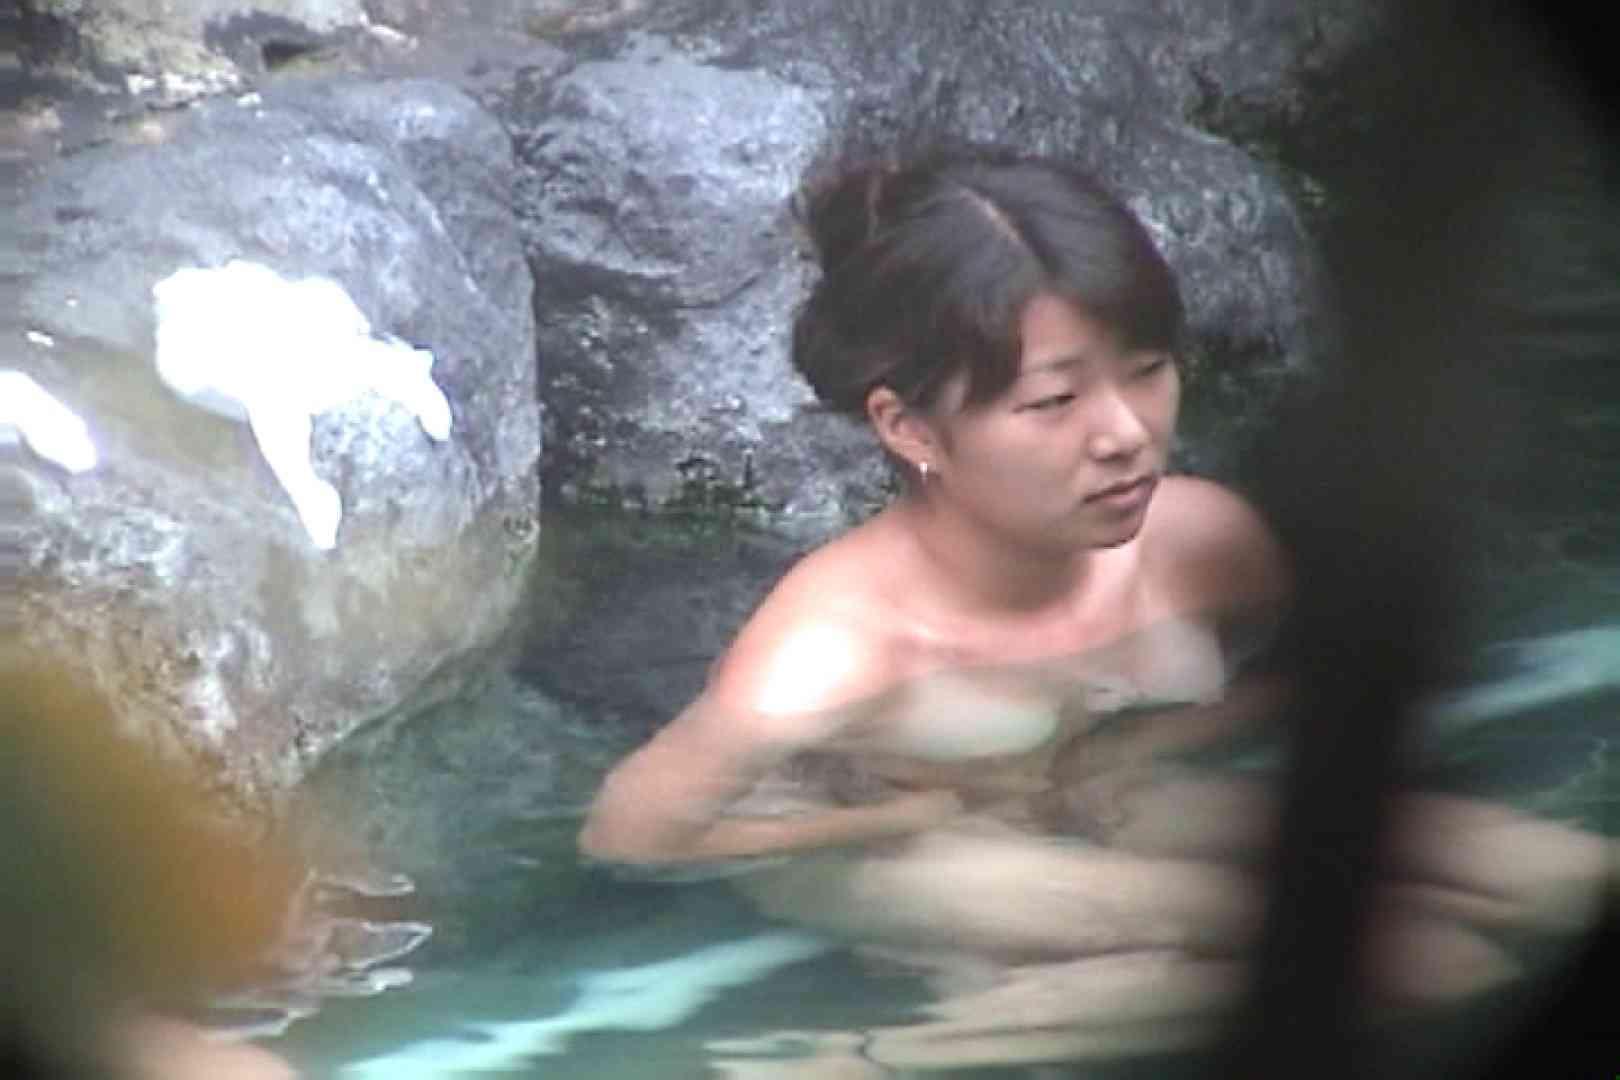 Aquaな露天風呂Vol.69【VIP限定】 盗撮 アダルト動画キャプチャ 106連発 98